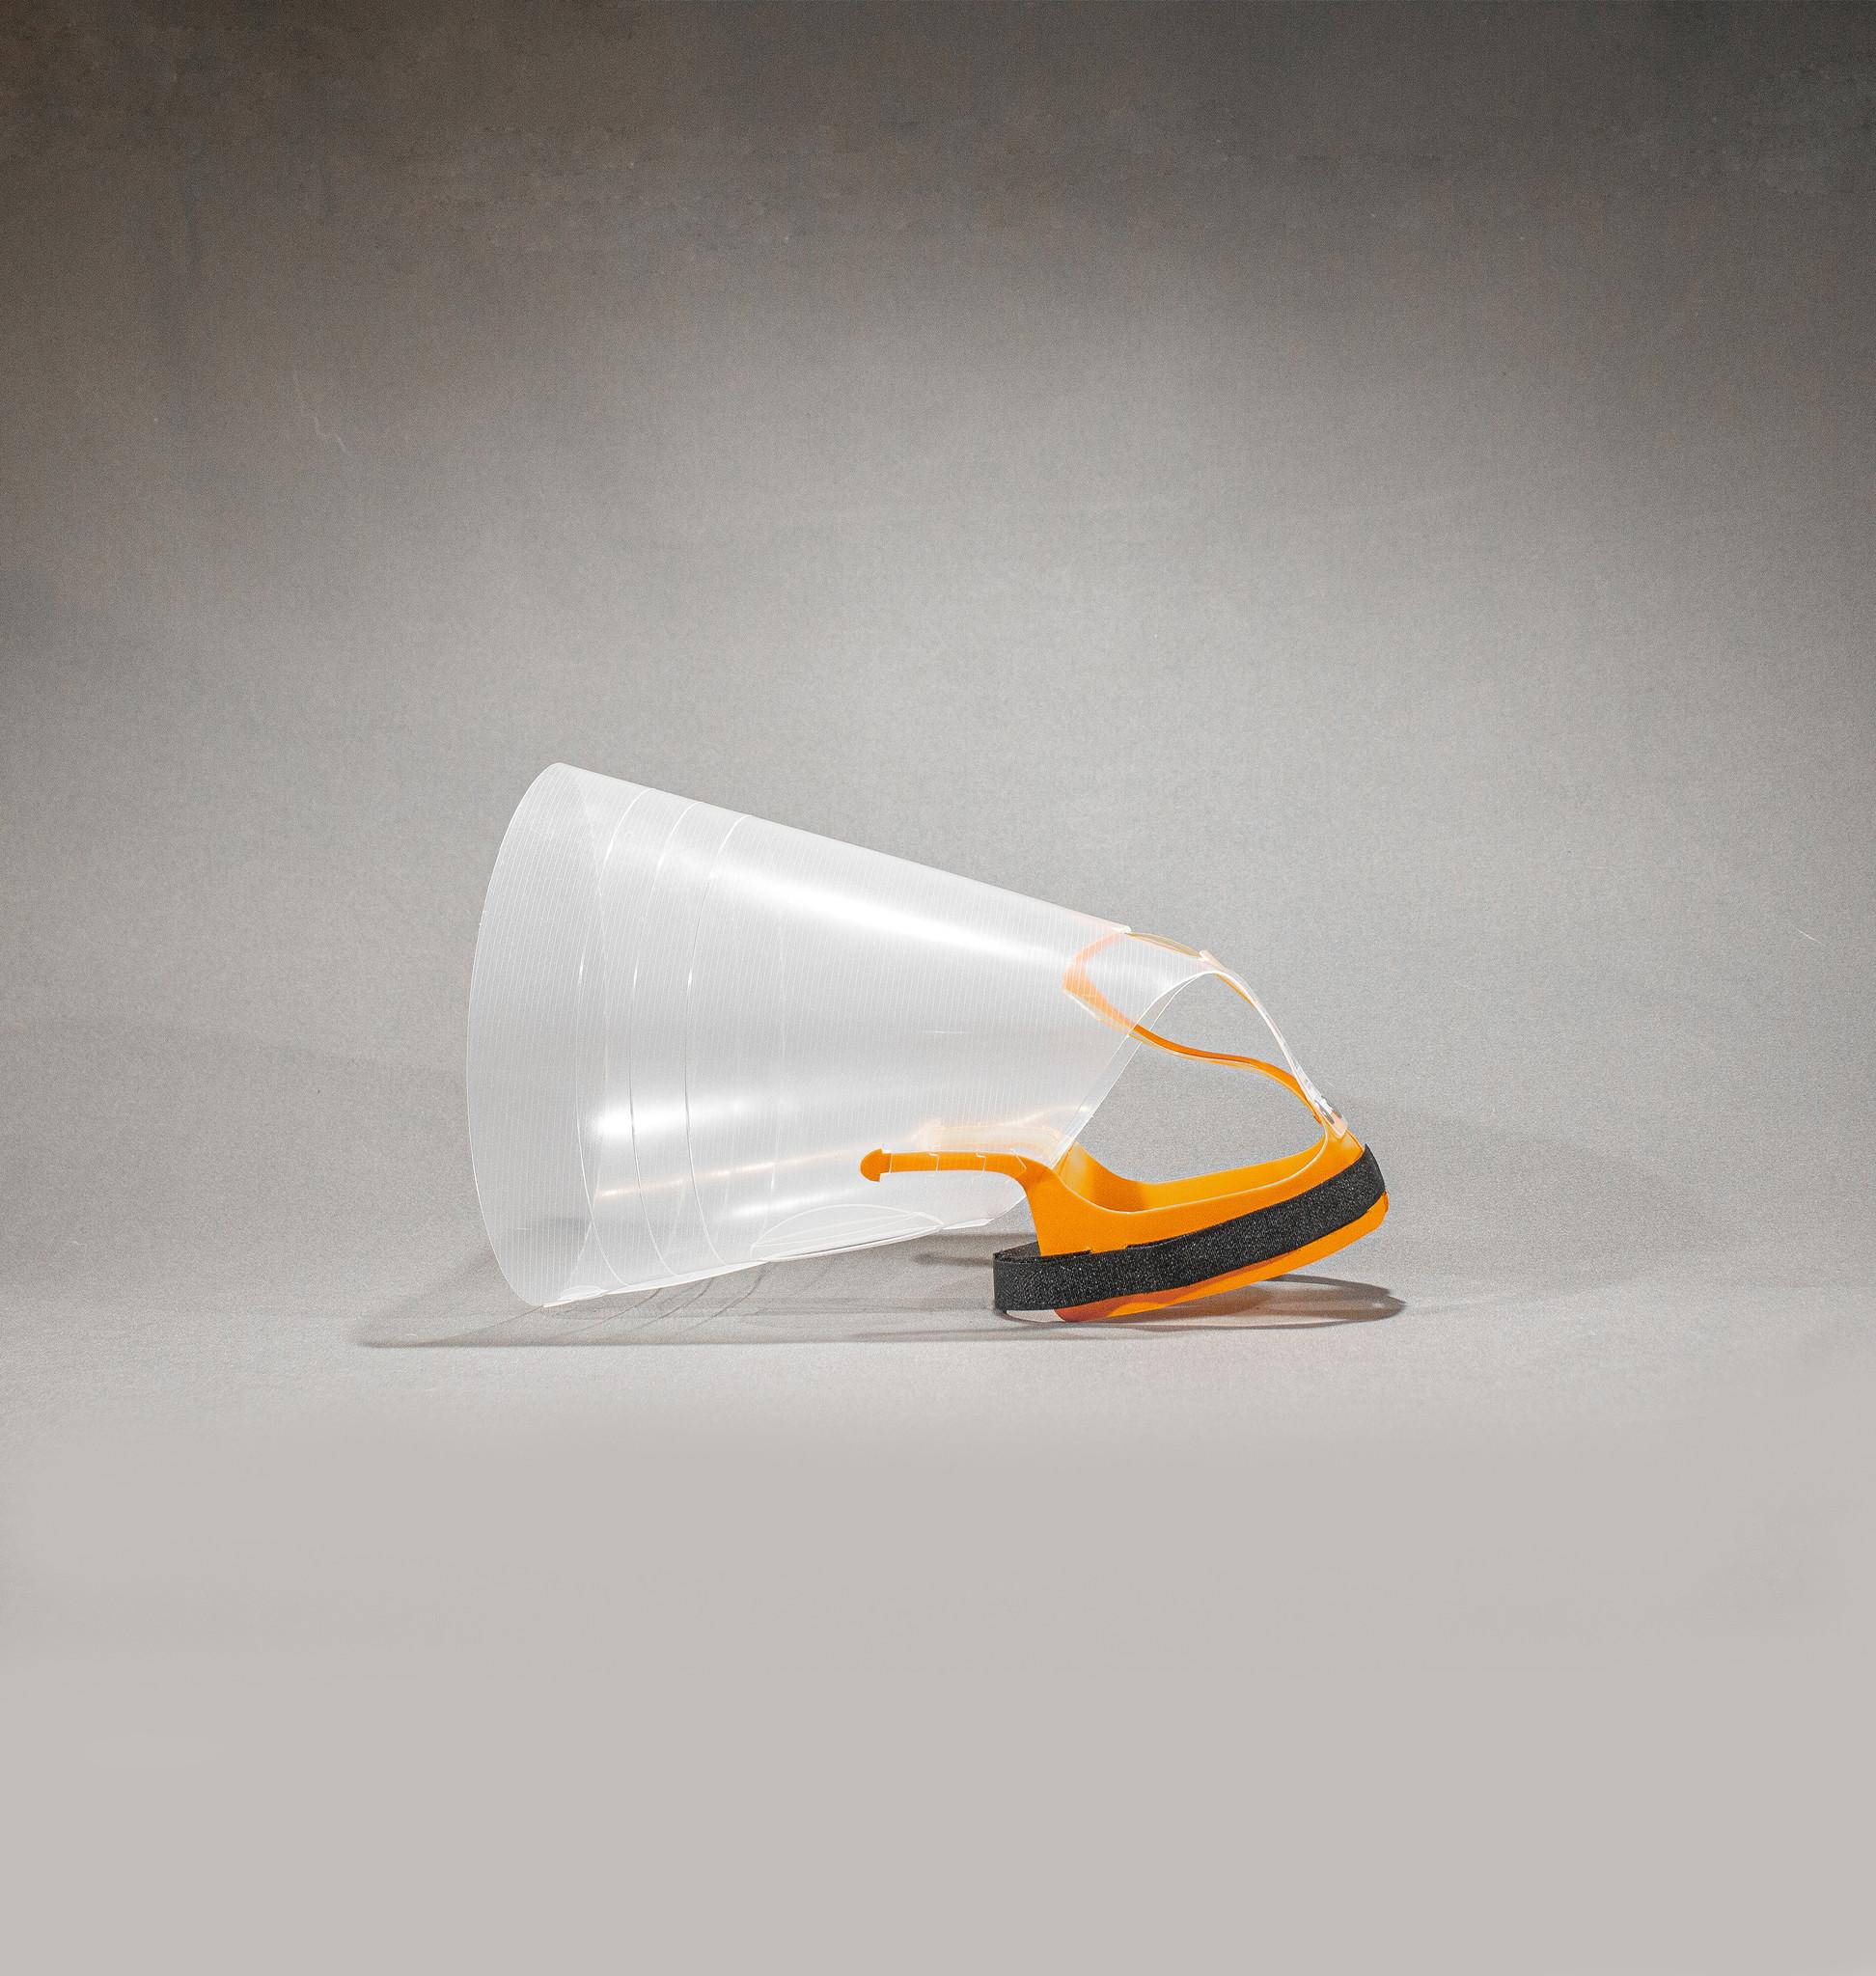 NOVAGUARD NOVAGUARD lick protection PN405, size: small, color: orange